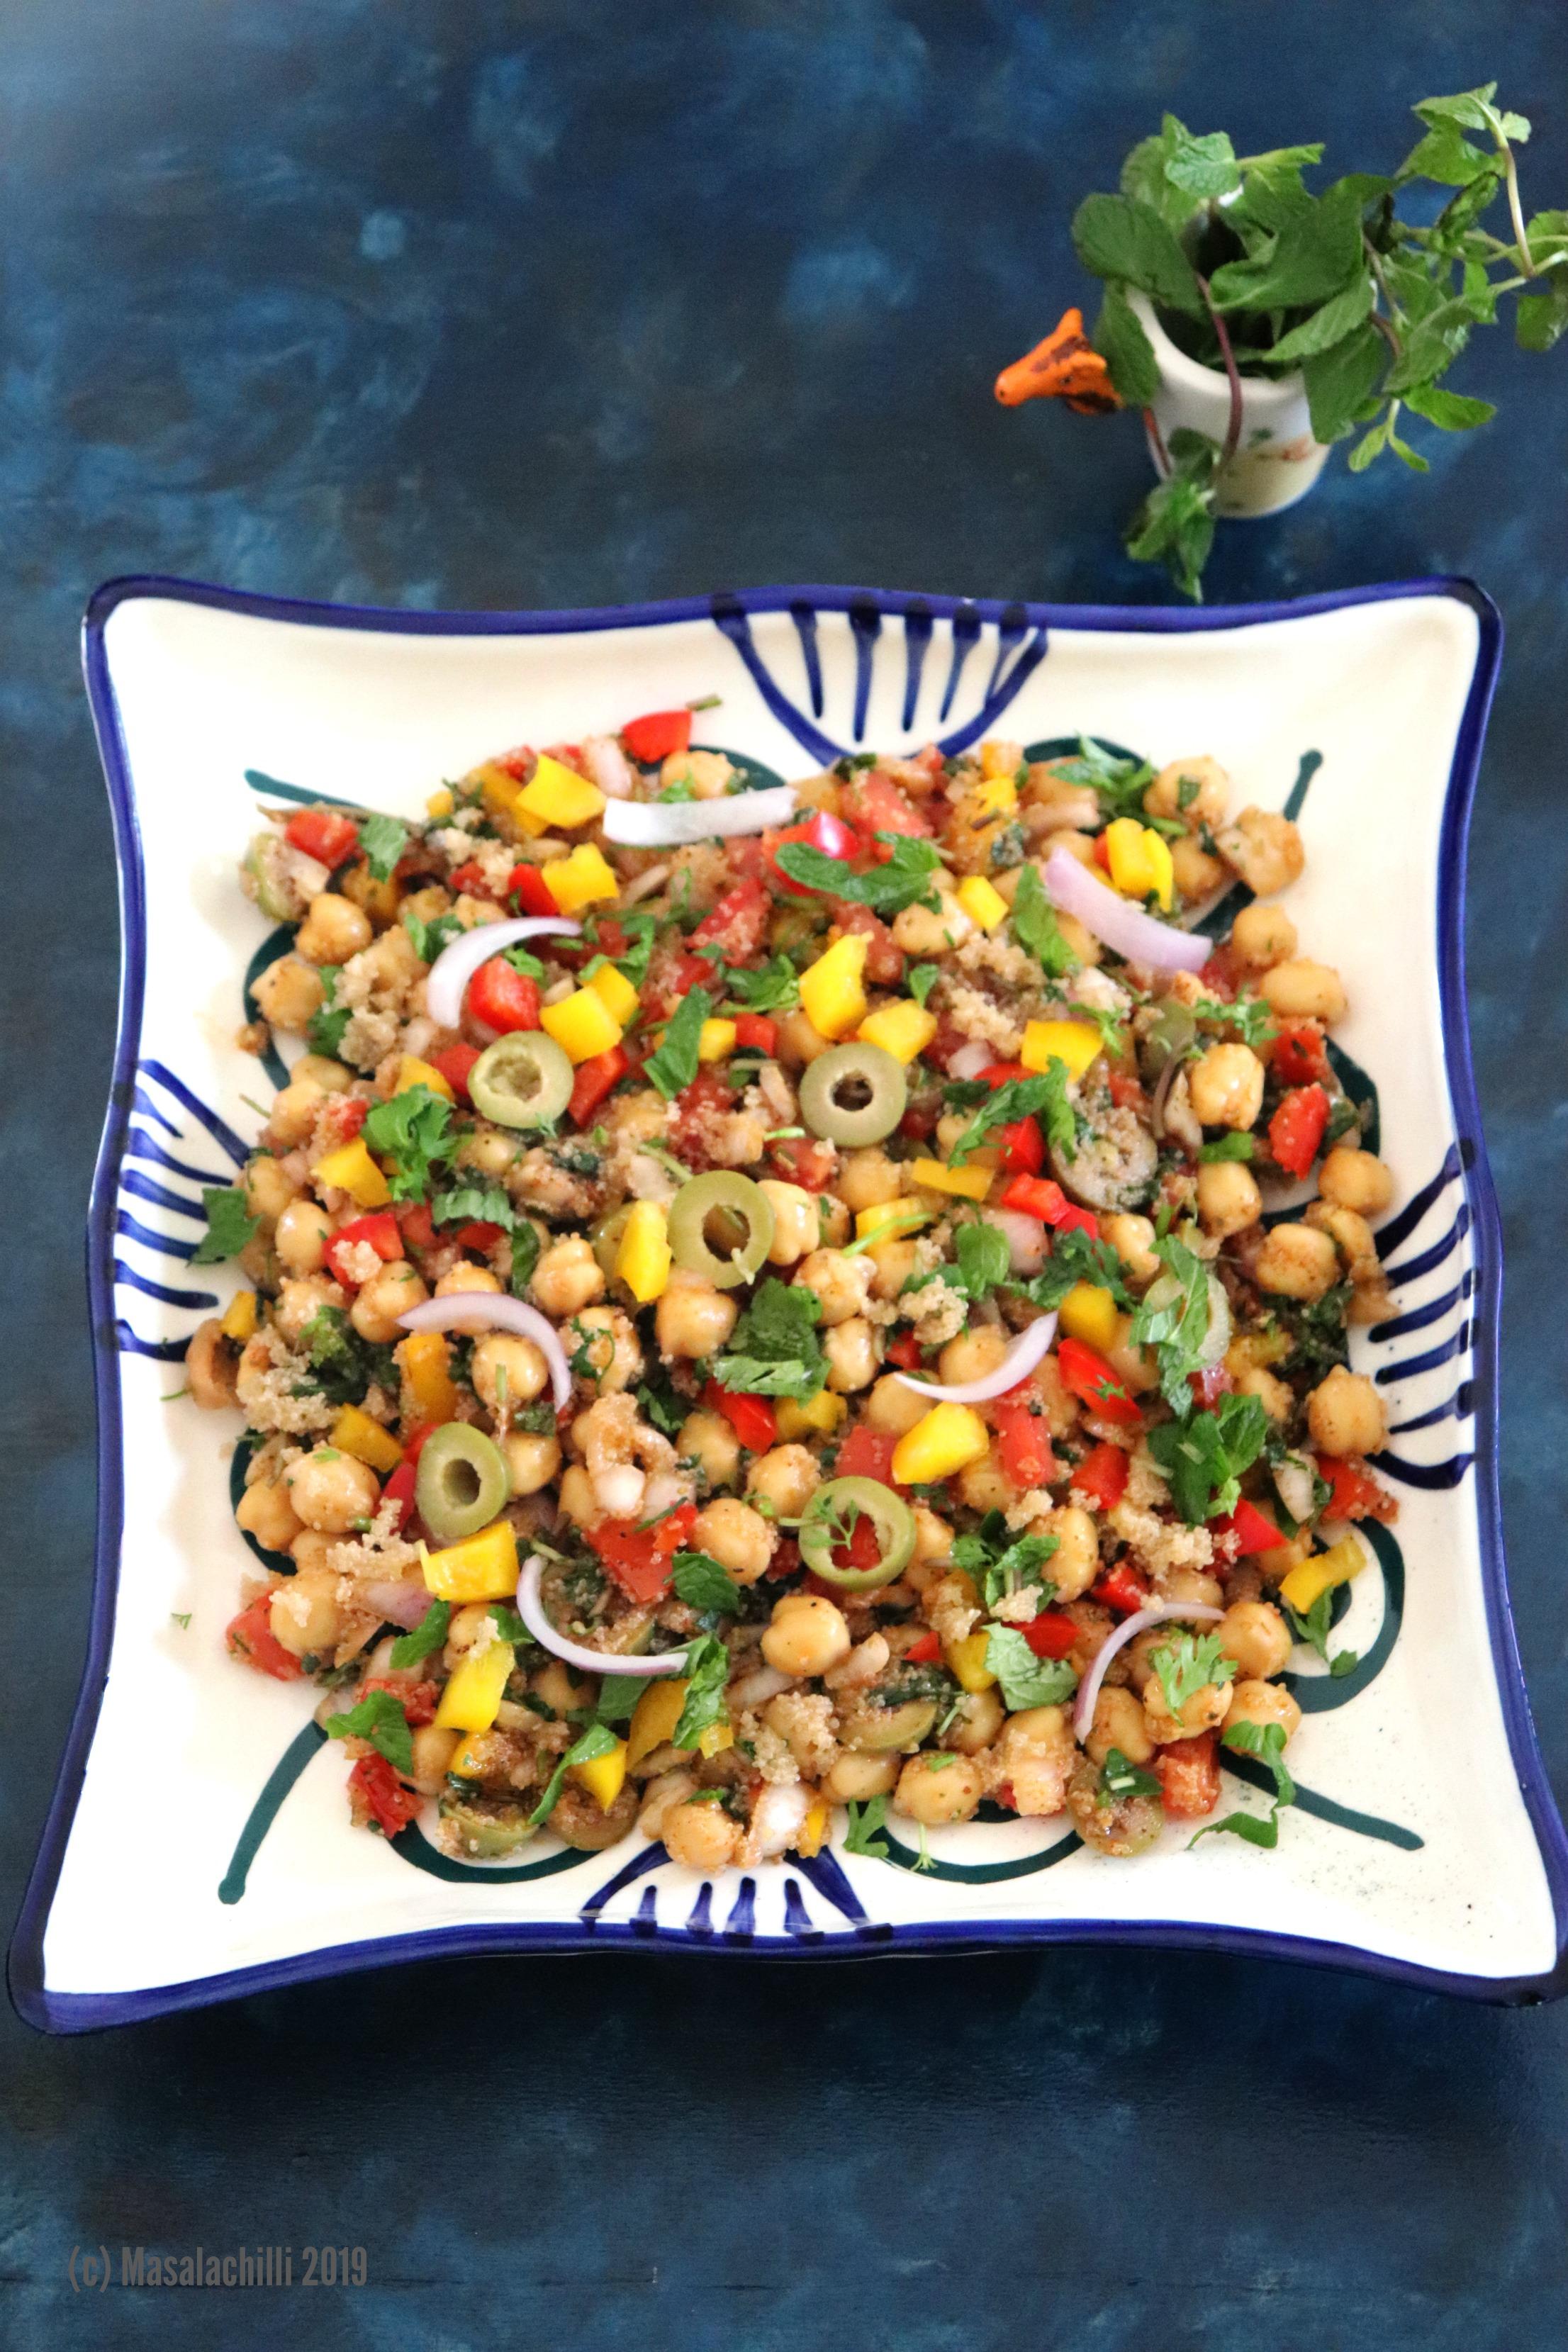 Mediterranean Chickpea Salad with Amaranth Couscous